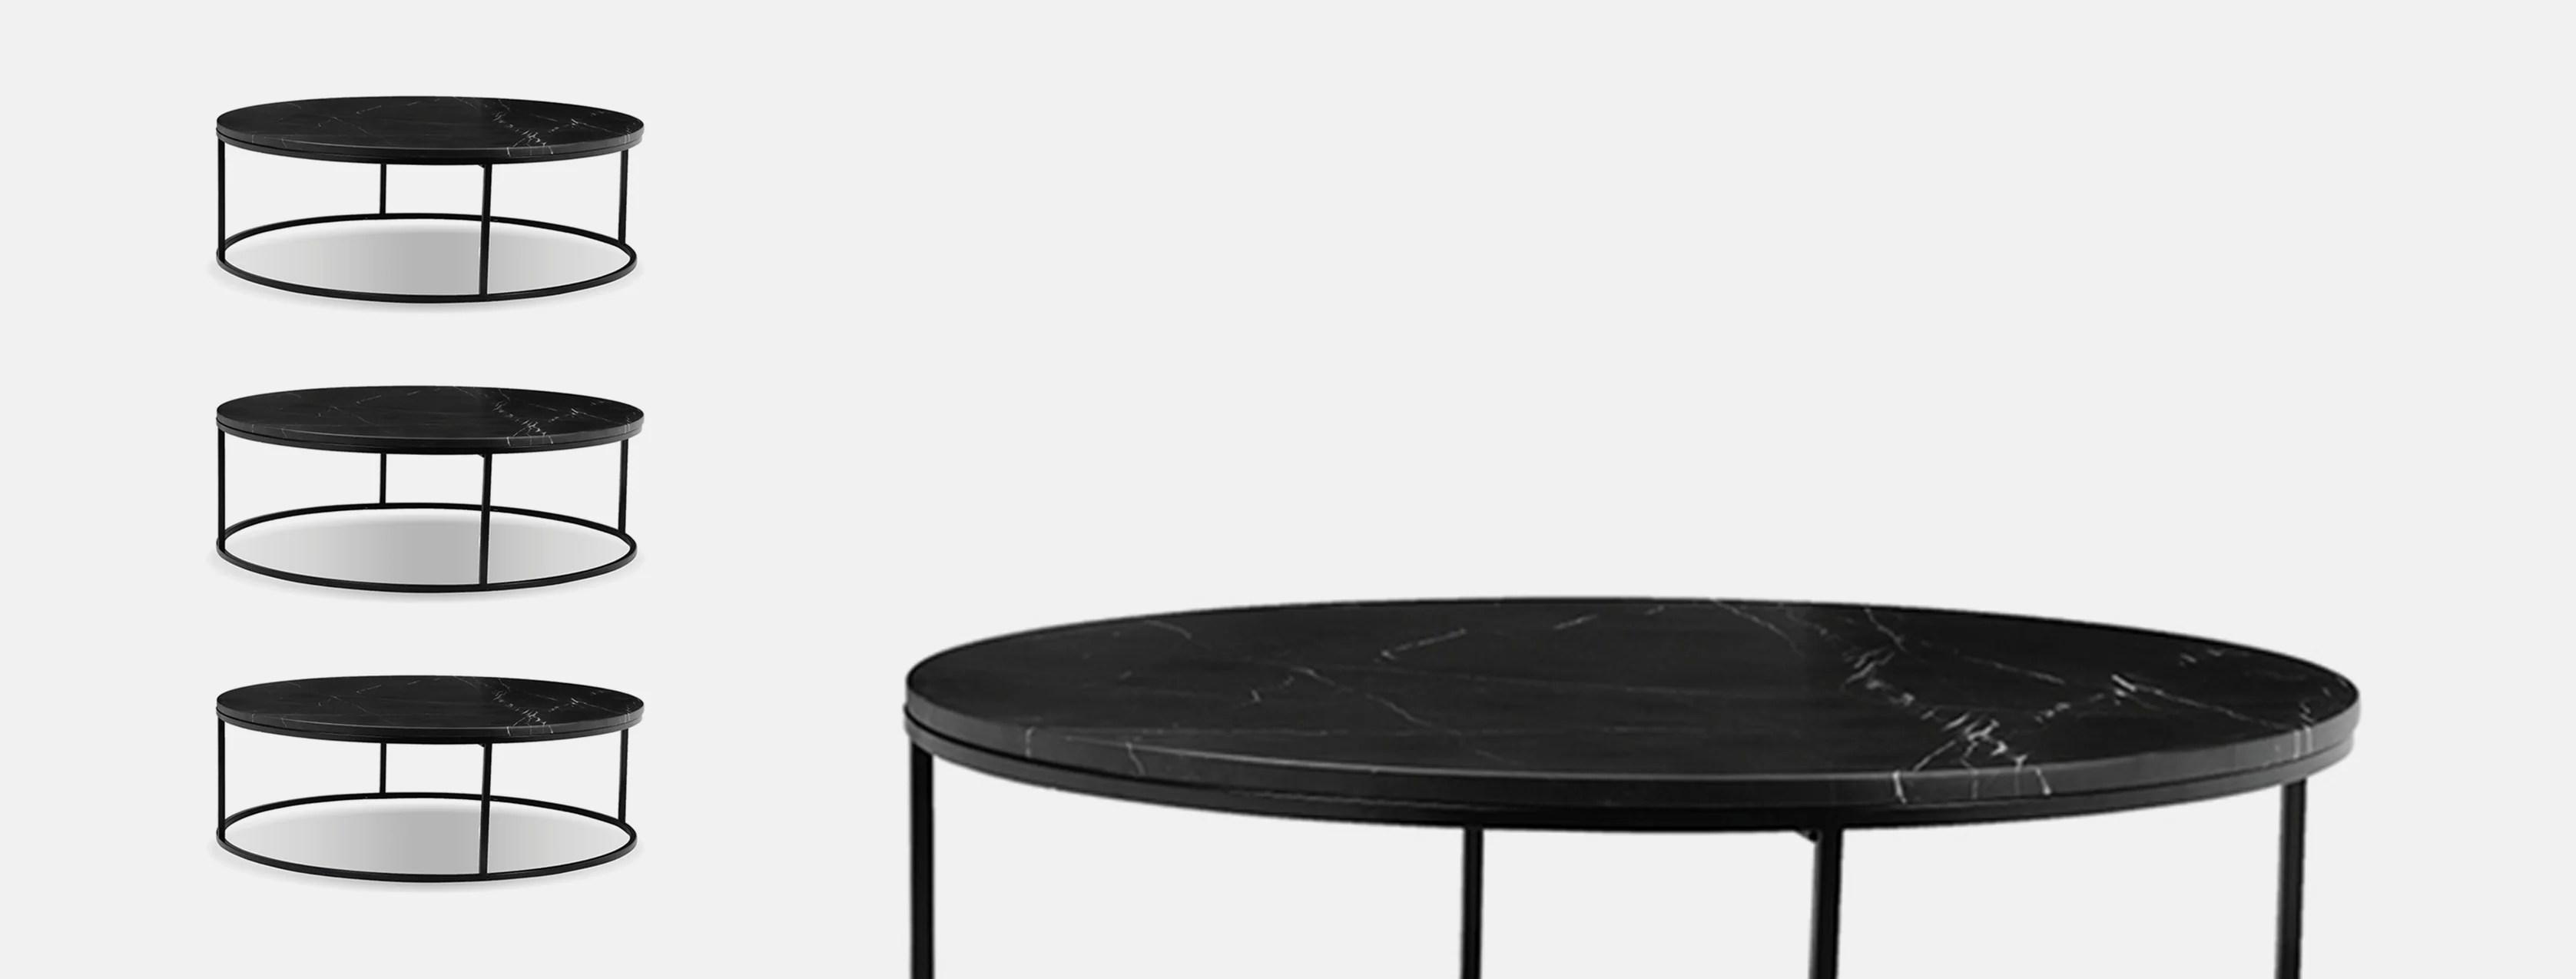 modern living room table interior design long rectangular tables coffee